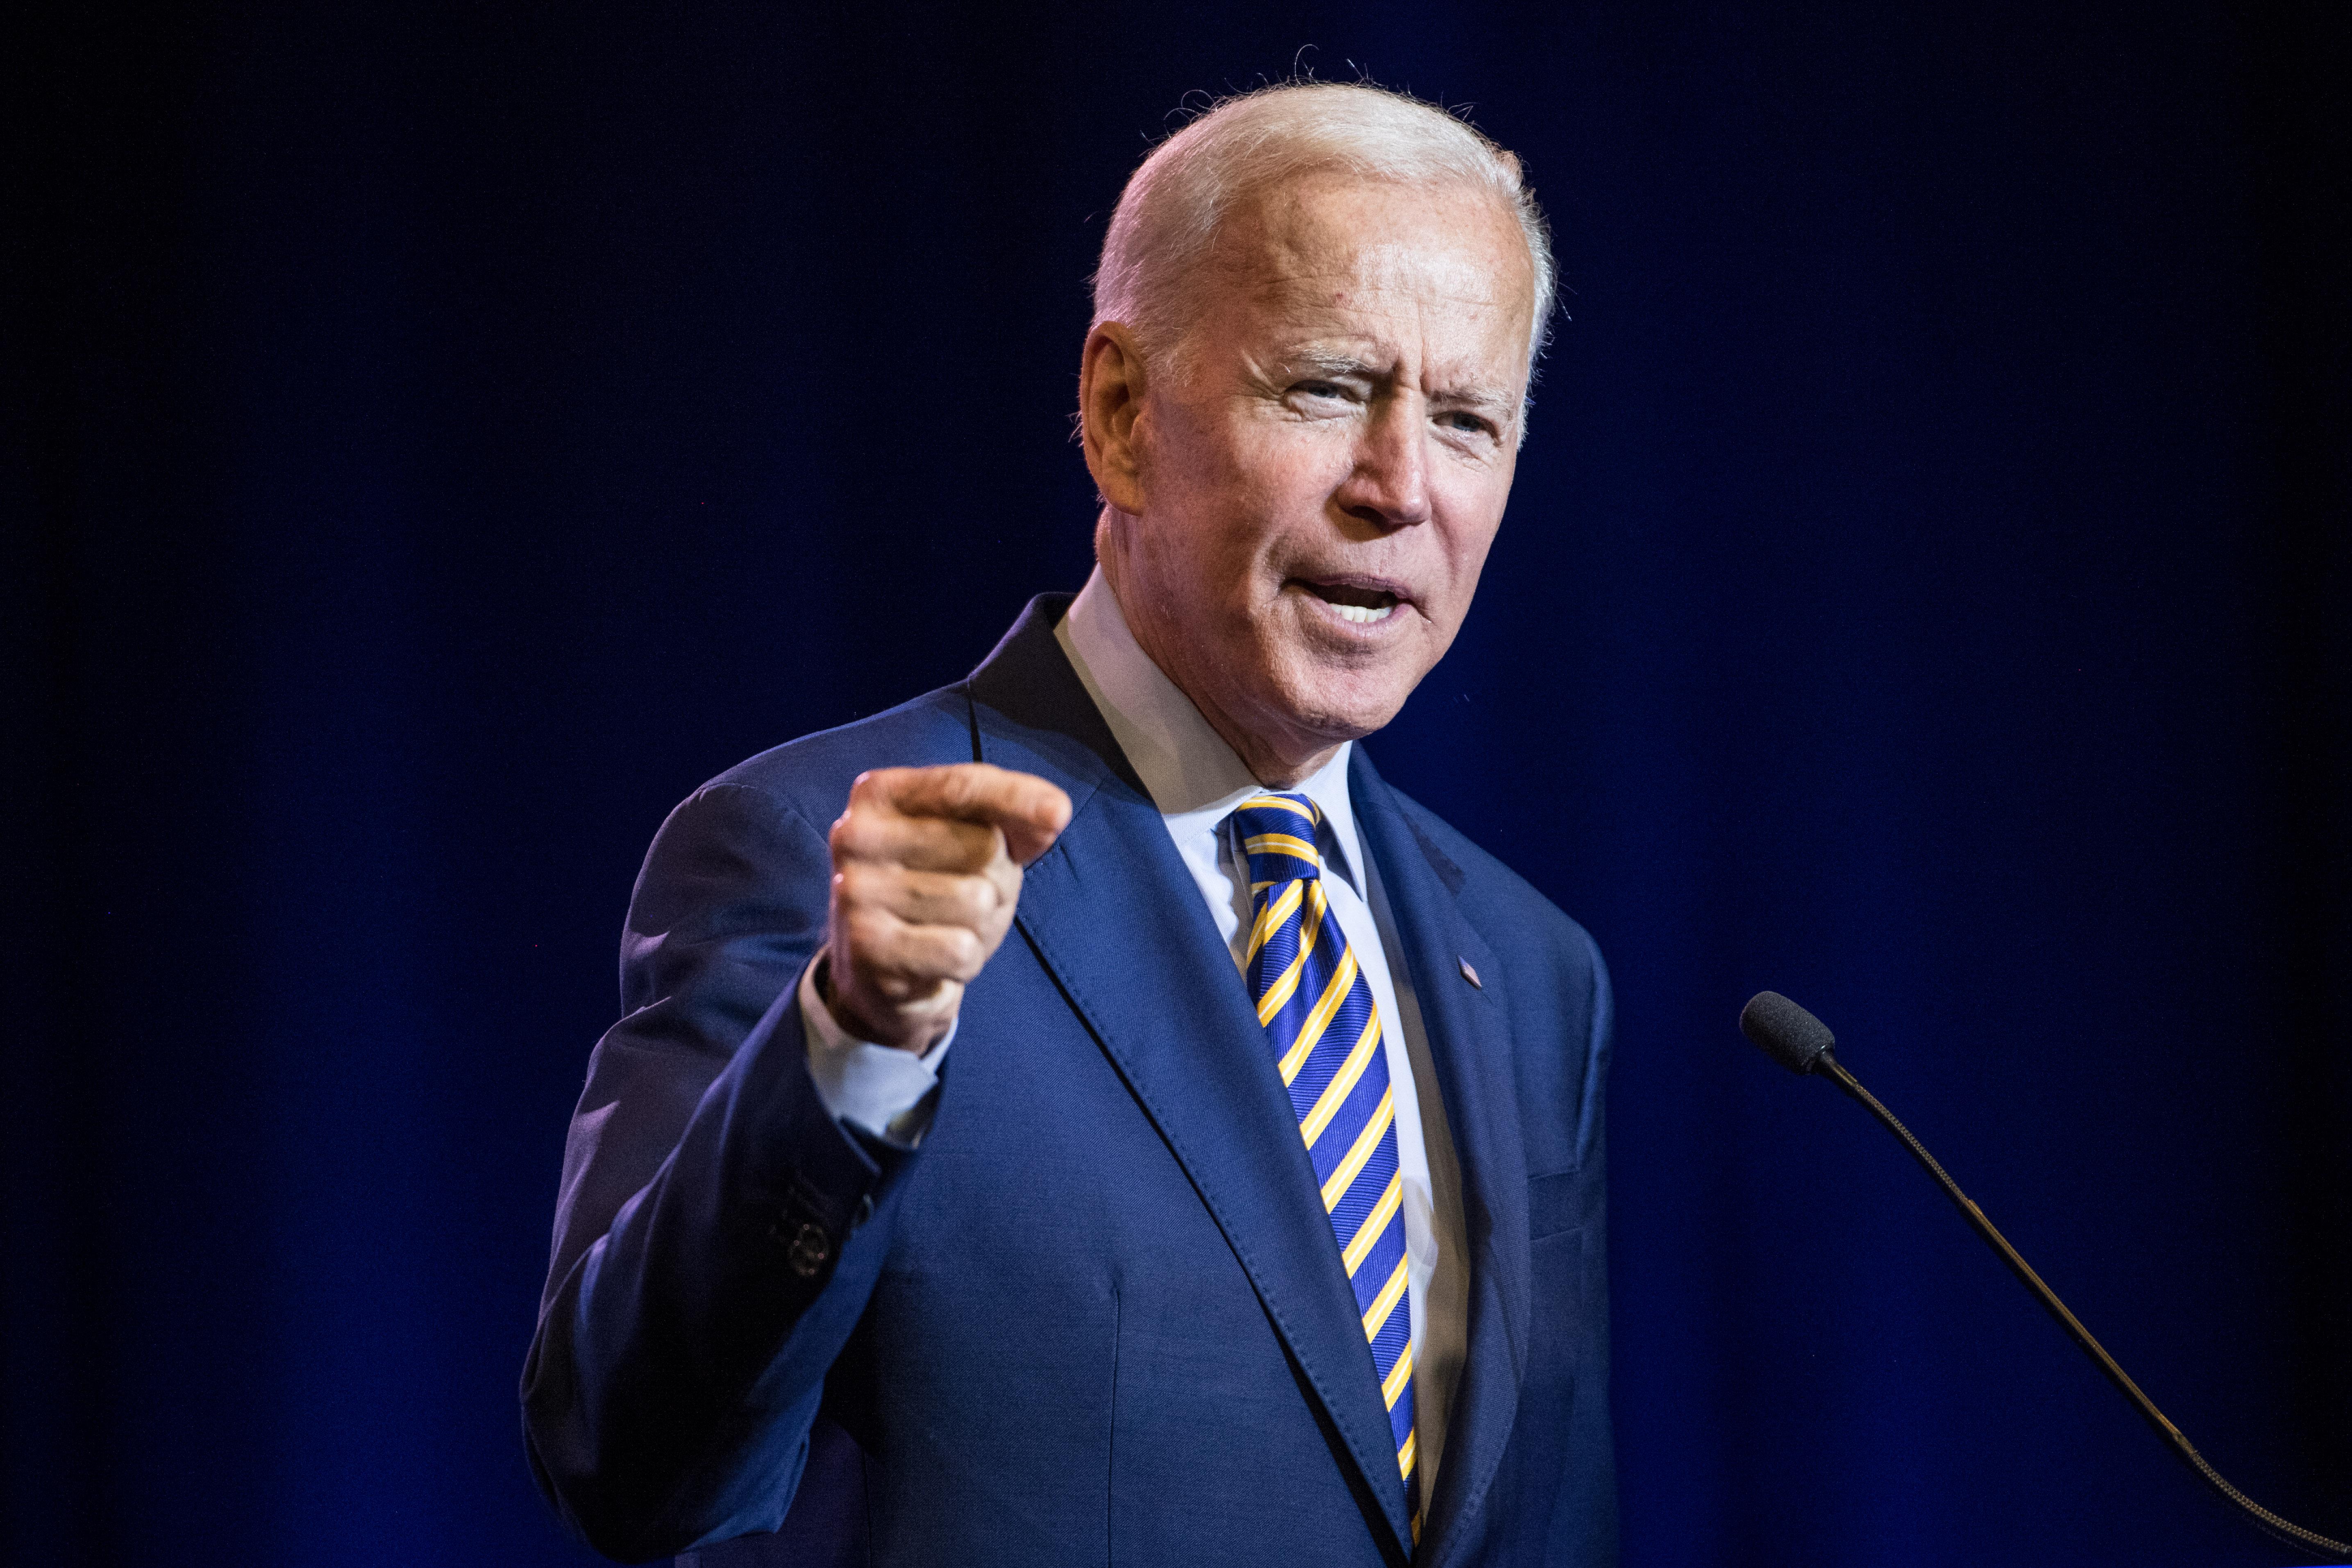 Democratic presidential candidate Joe Biden.